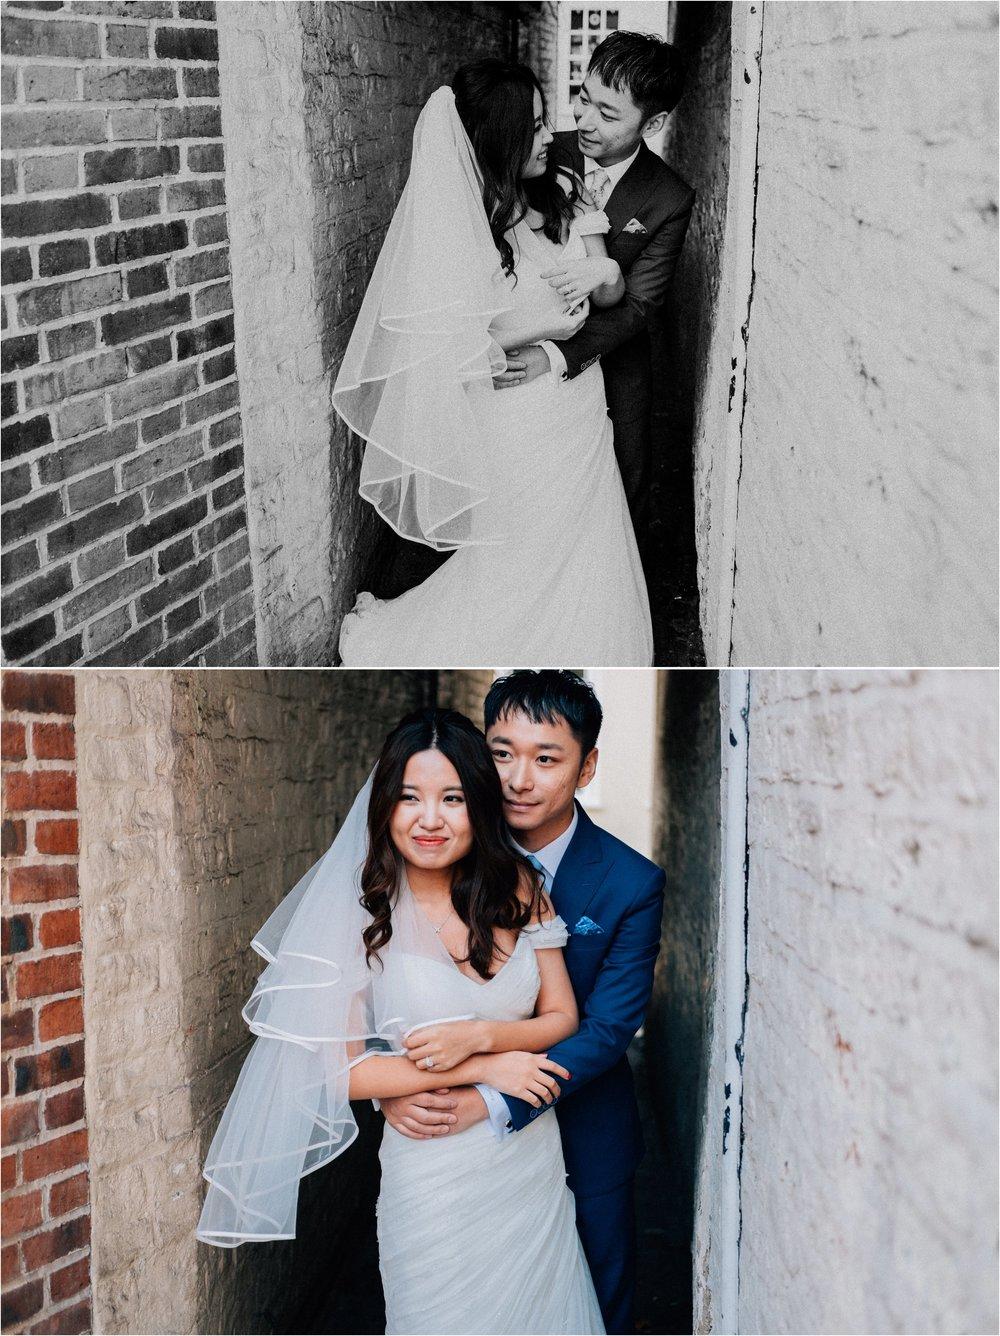 York city elopement wedding photographer_0097.jpg